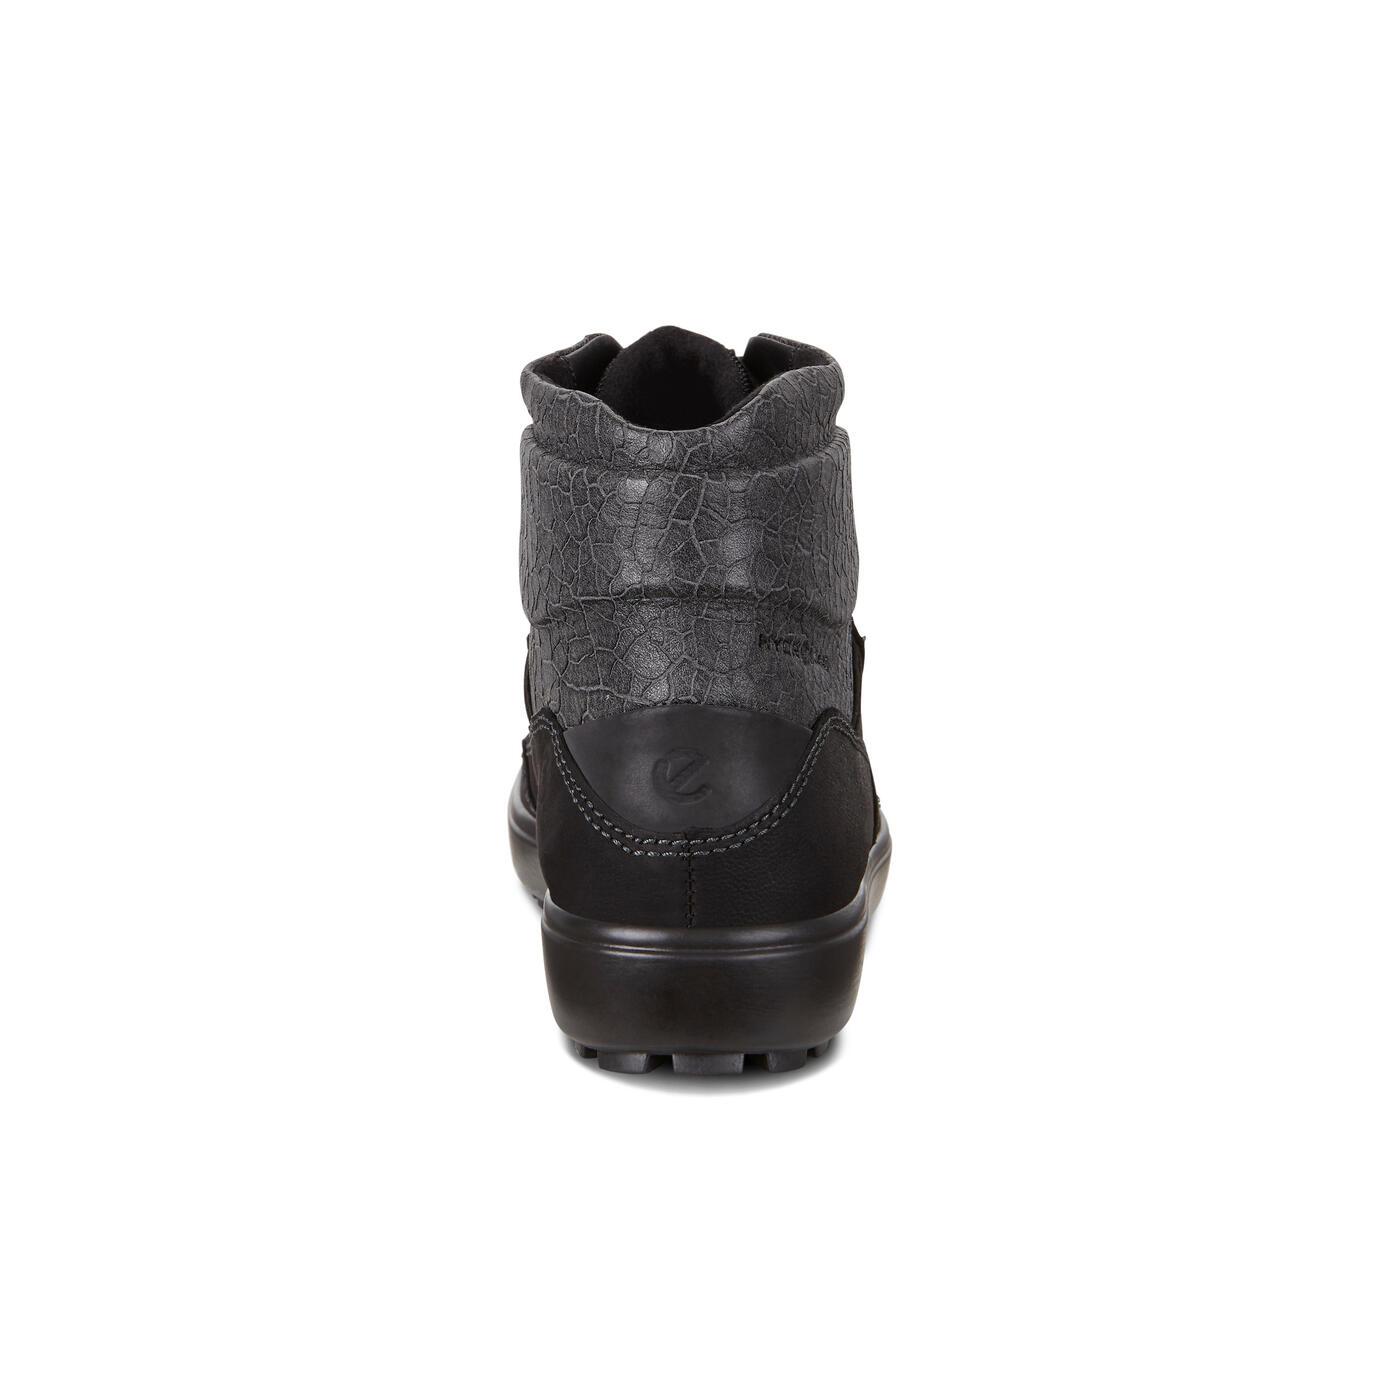 ECCO Soft 7 Tred Women's Boot